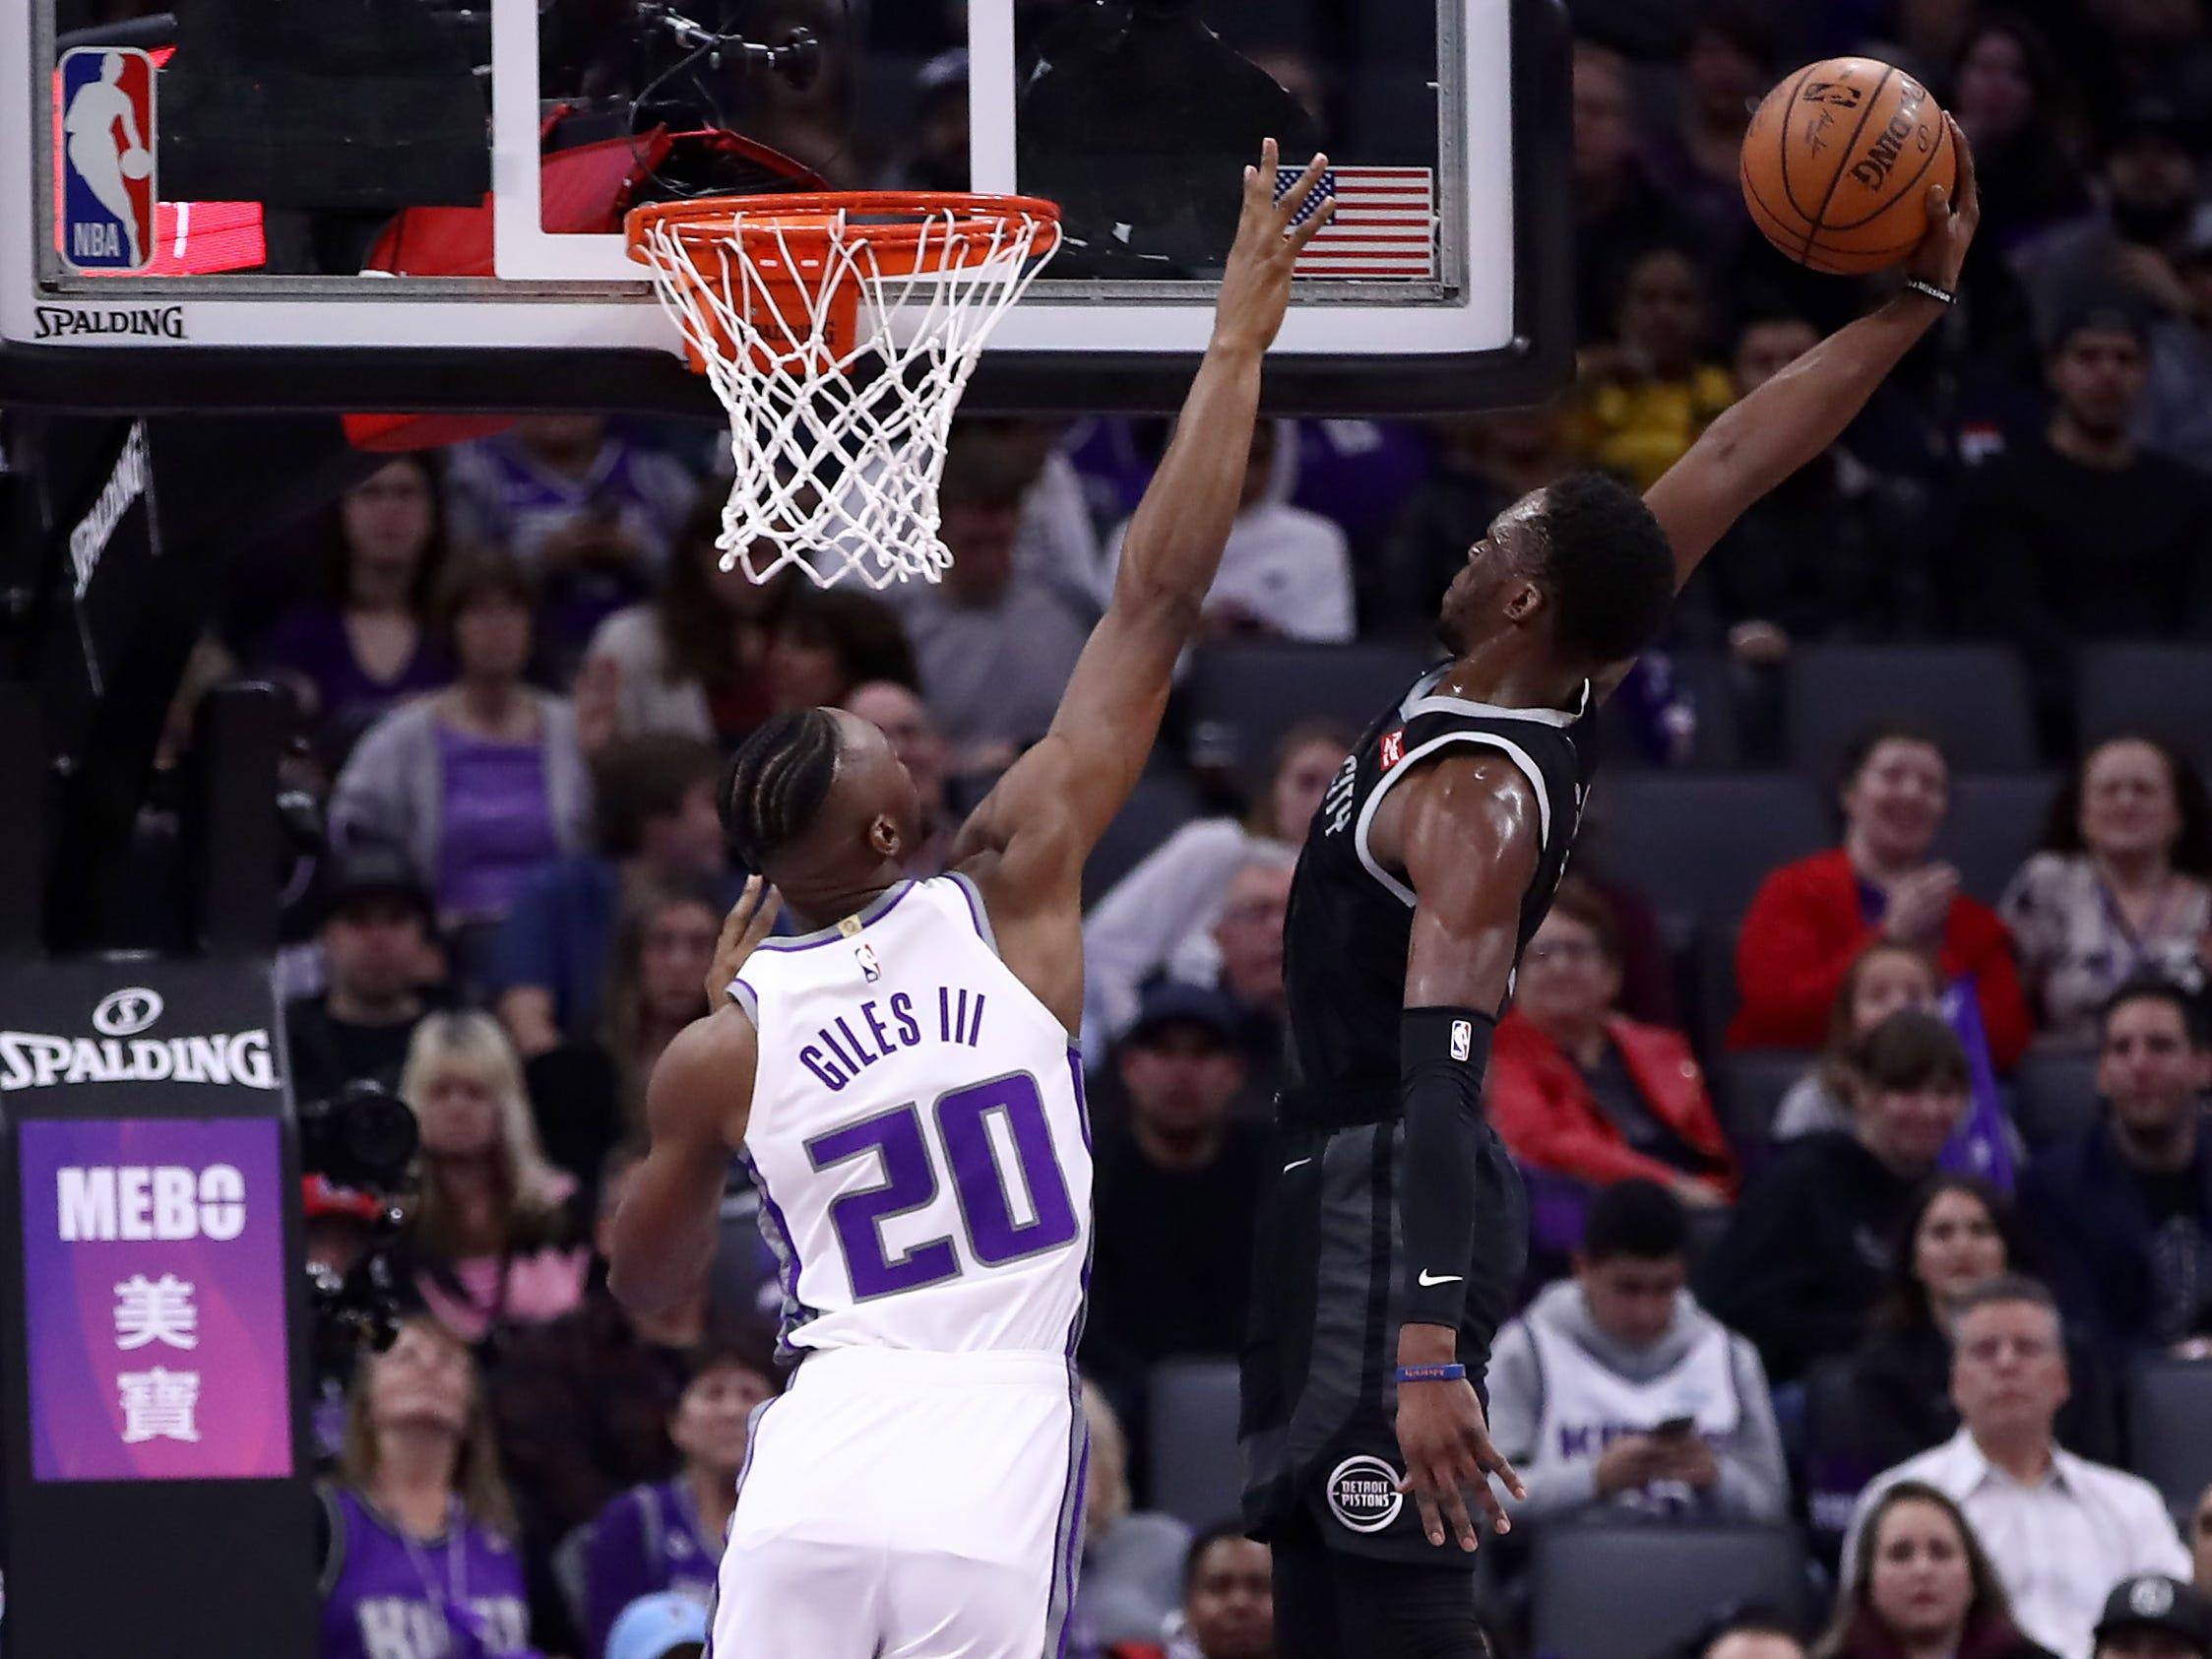 Reggie Jackson #1 of the Detroit Pistons dunks the ball on Harry Giles #20 of the Sacramento Kings at Golden 1 Center on January 10, 2019 in Sacramento, California.